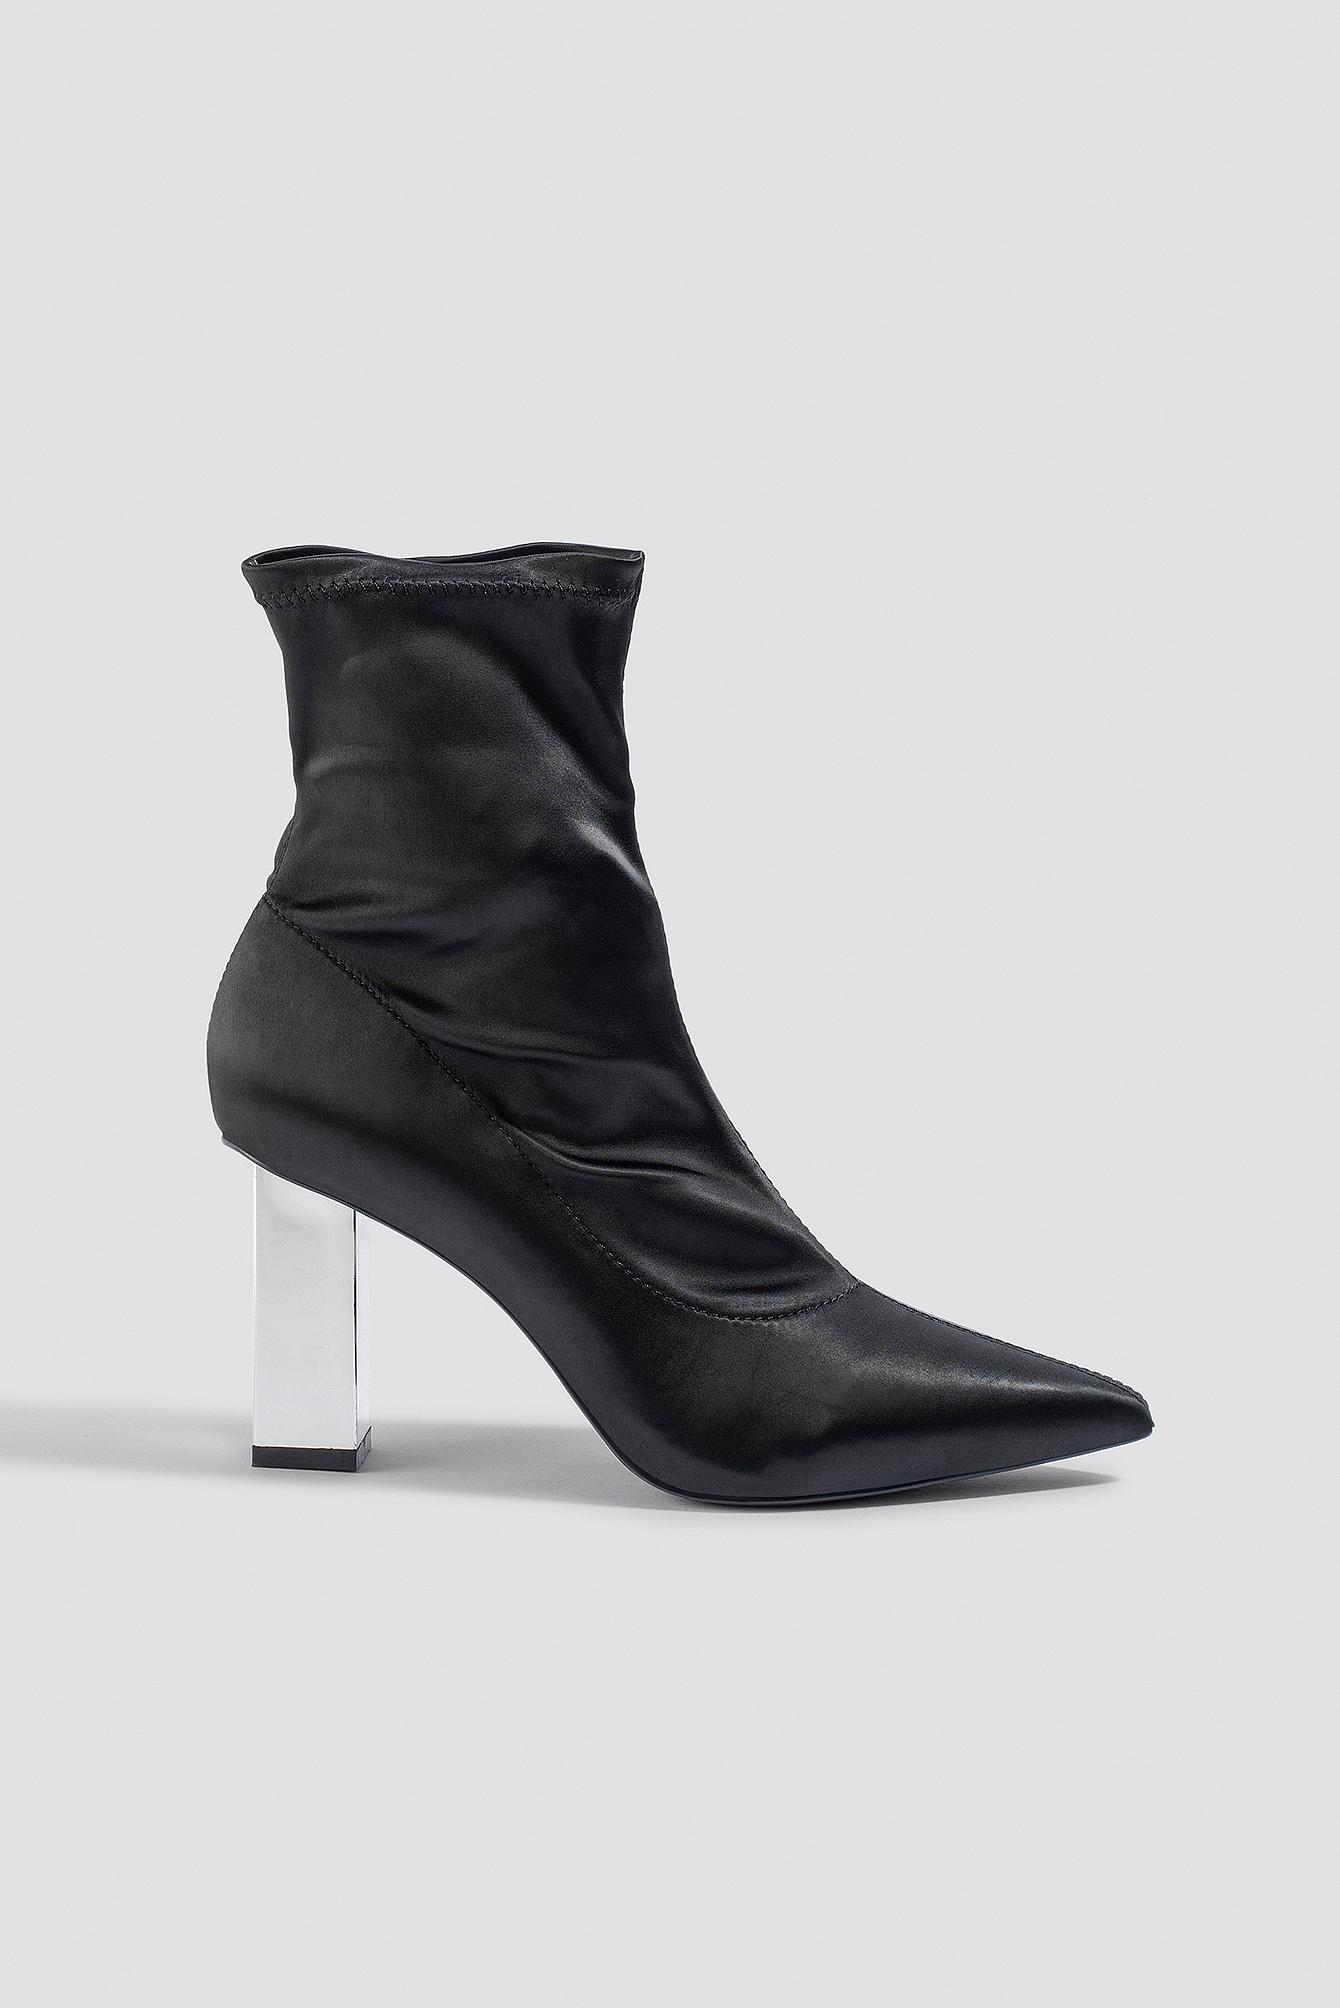 na-kd shoes -  Metallic Block Heel Sock Boots - Black